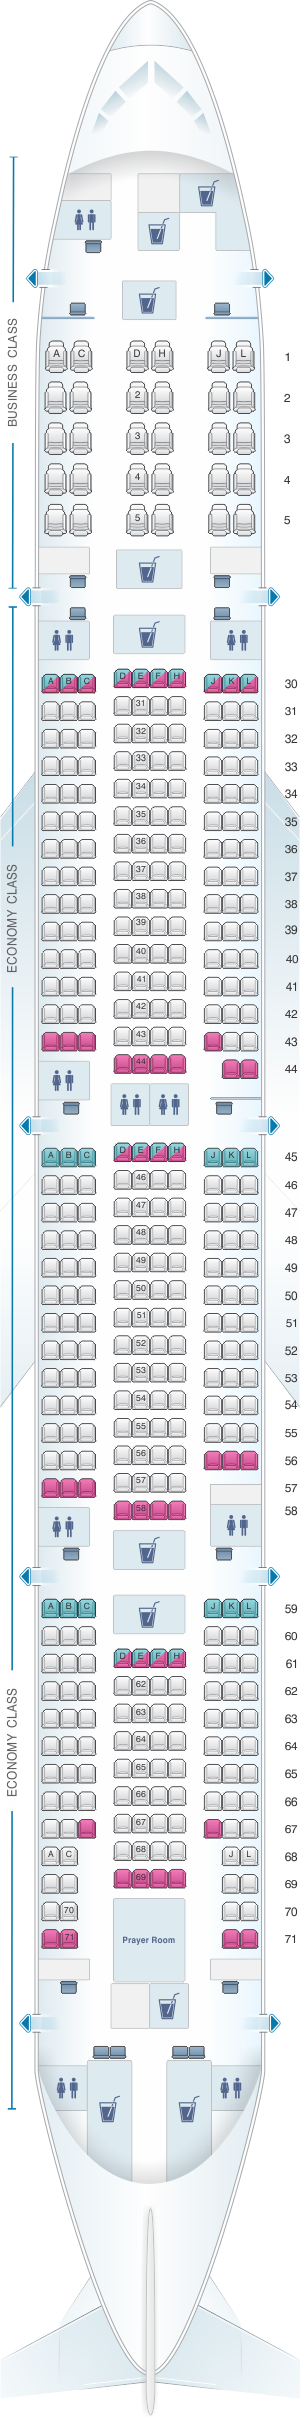 Seat map for Saudi Arabian Airlines Boeing B777 300 (773)